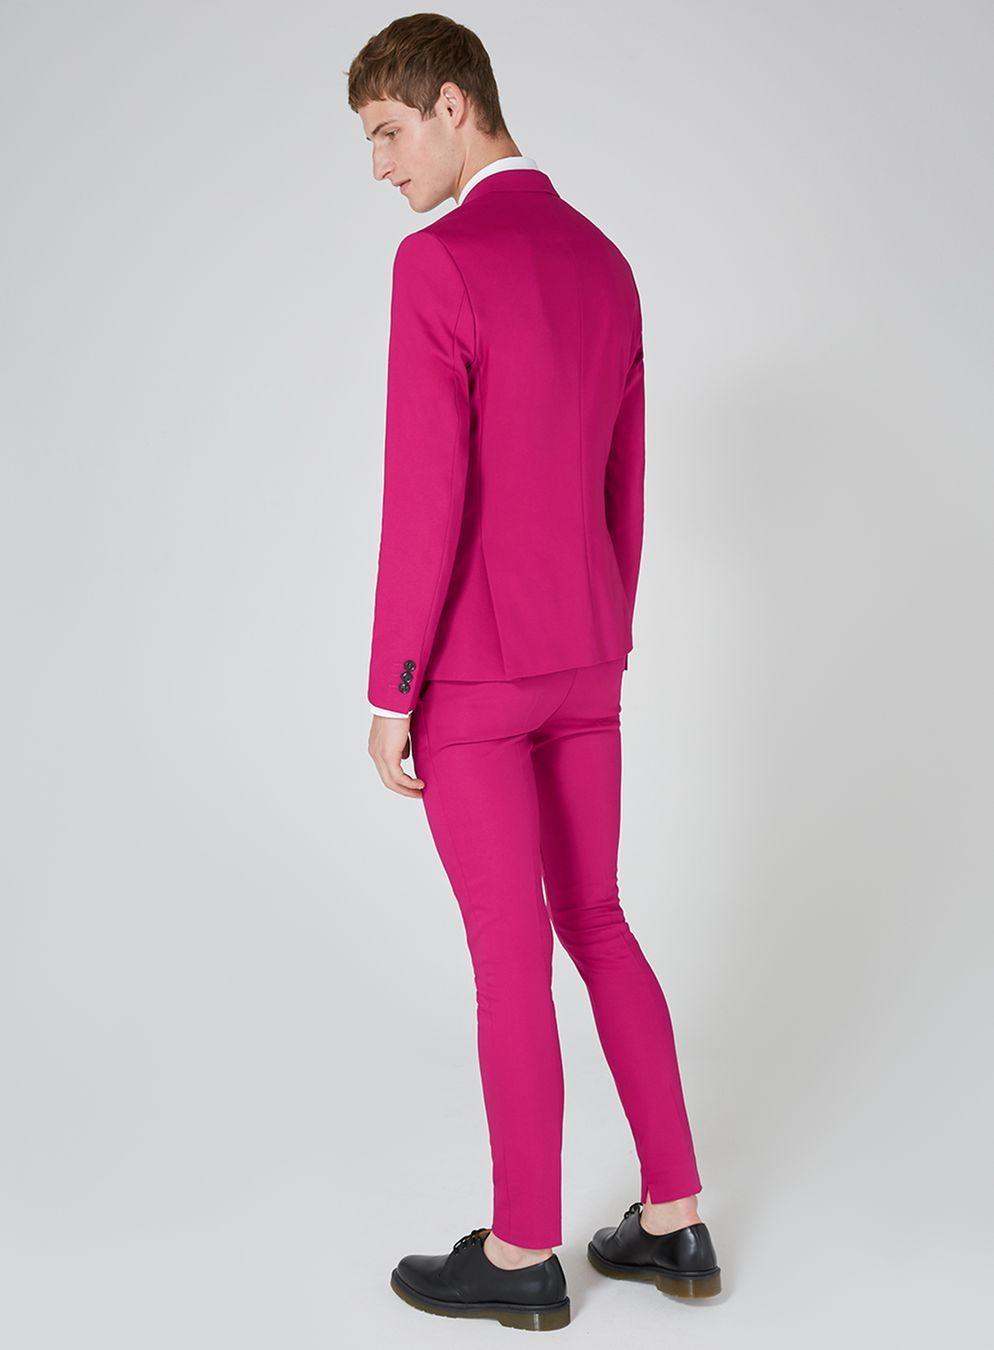 Bright Pink Spray On Suit - TOPMAN | Topman | Pinterest | Bright pink